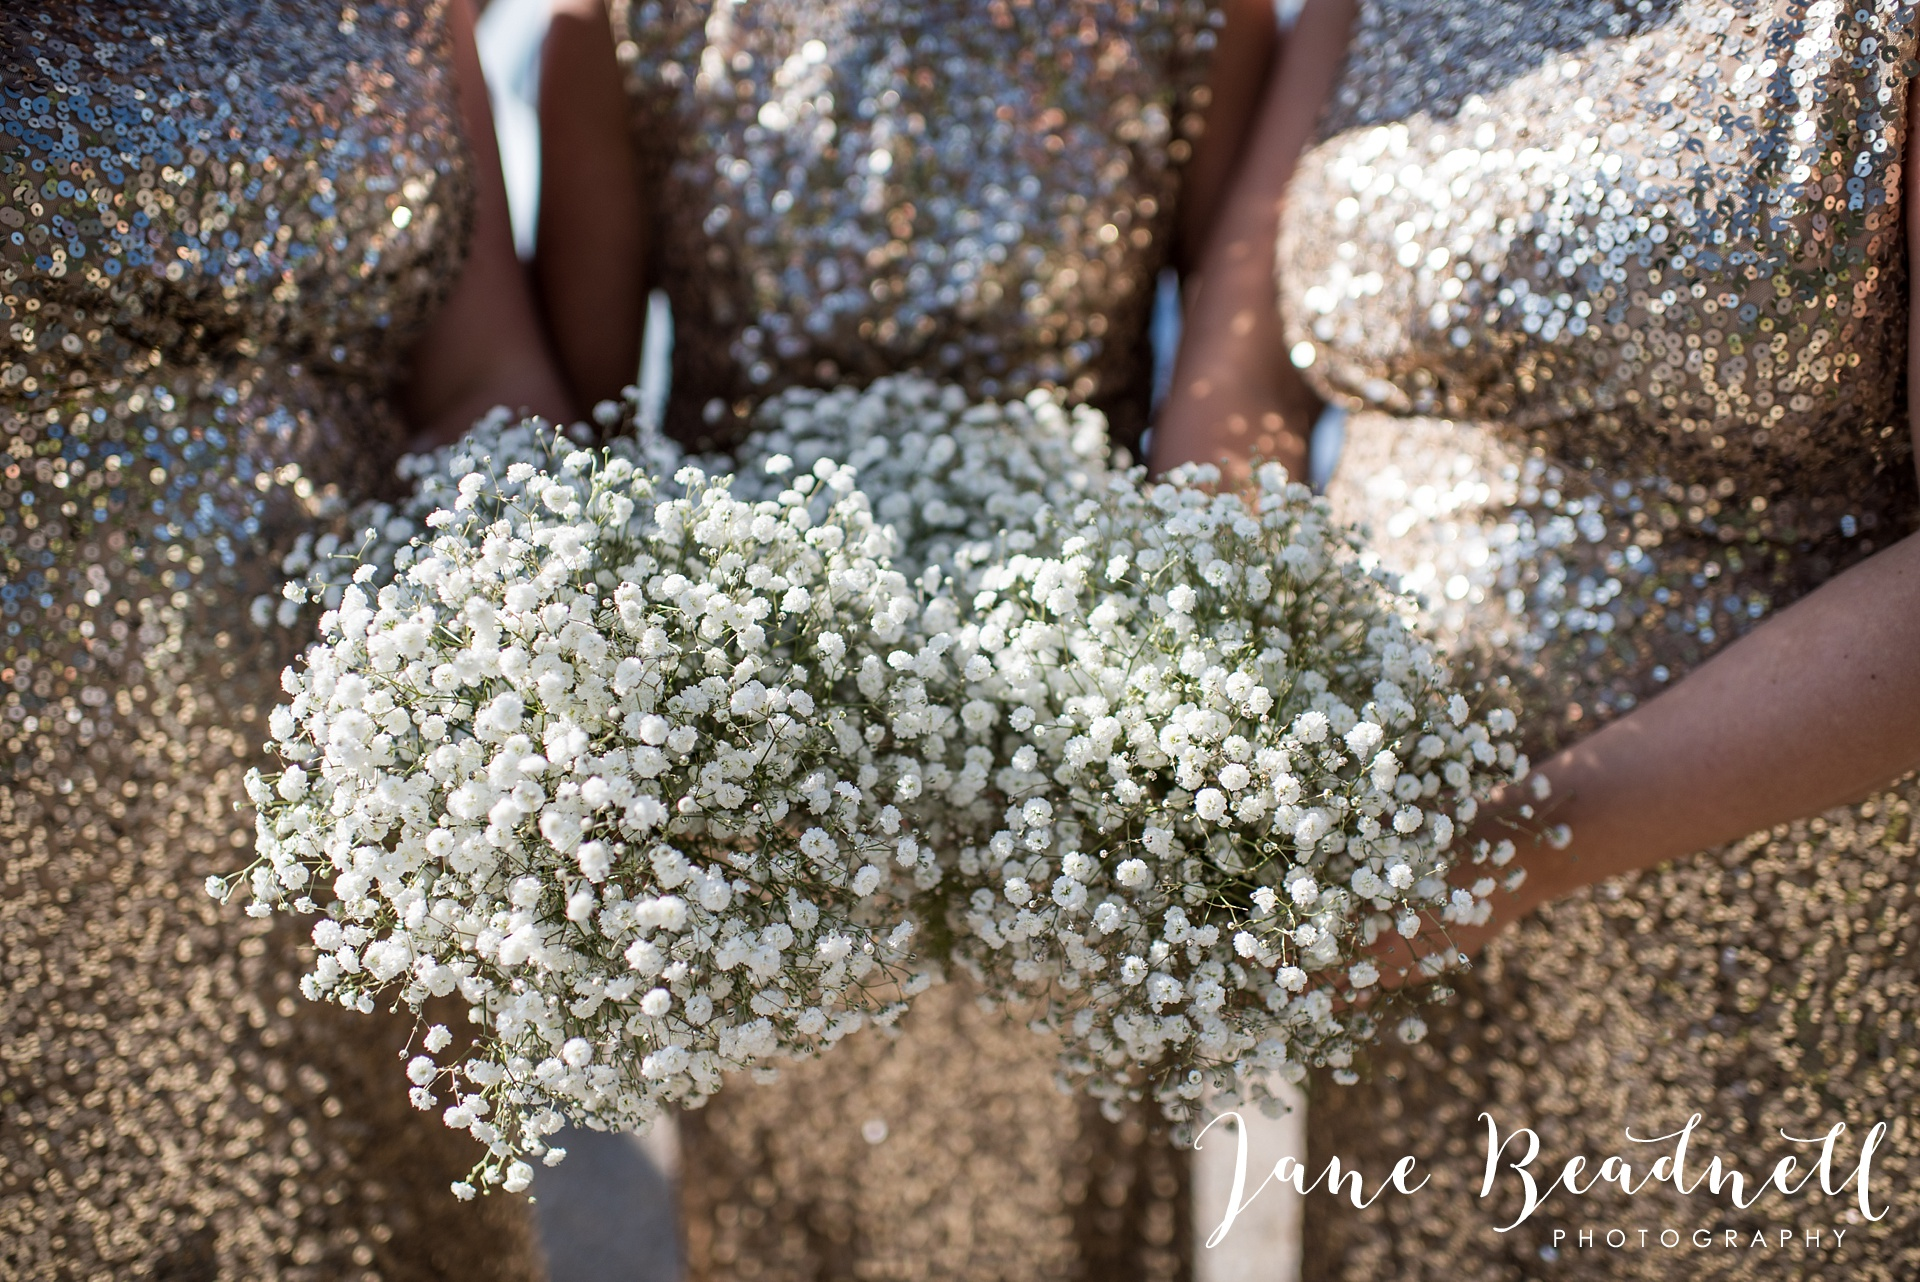 fine-art-wedding-photographer-jane-beadnell-yorkshire-wedding-photographer_0043